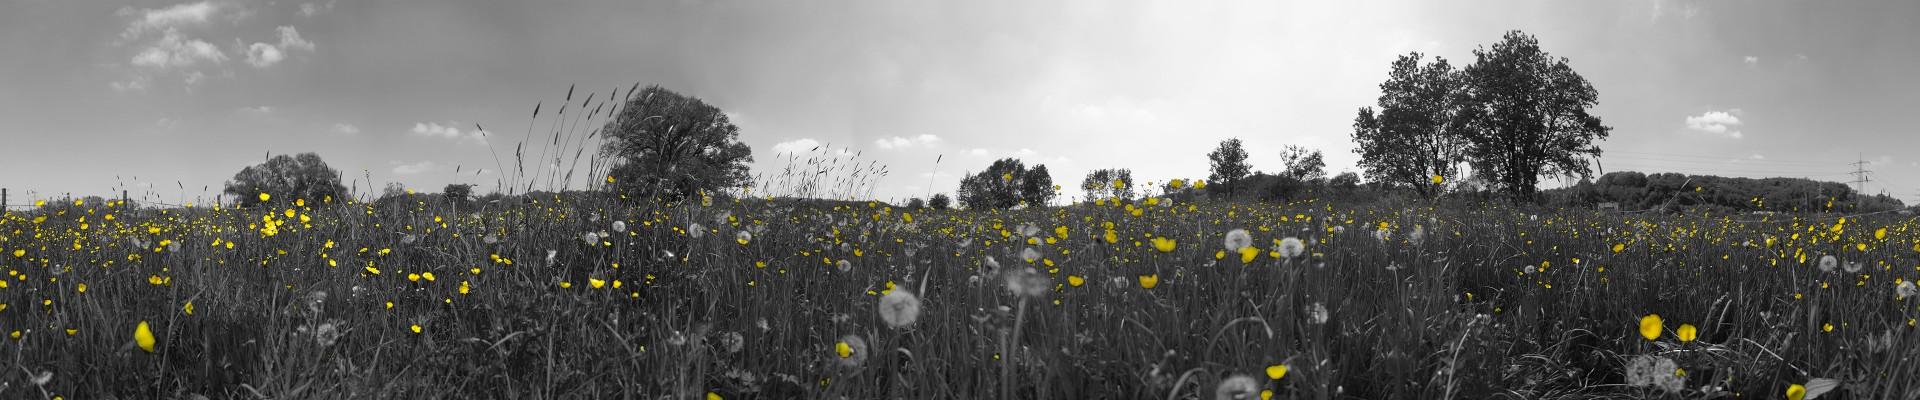 Panorama Wiese + Bäume sw/gelb • Lambda-Print auf FUJIFILM Crystal Archive DPII, Diasec®/Acryl, 120 x 25 cm • Auflage: 5 + 2 Artist's Proof